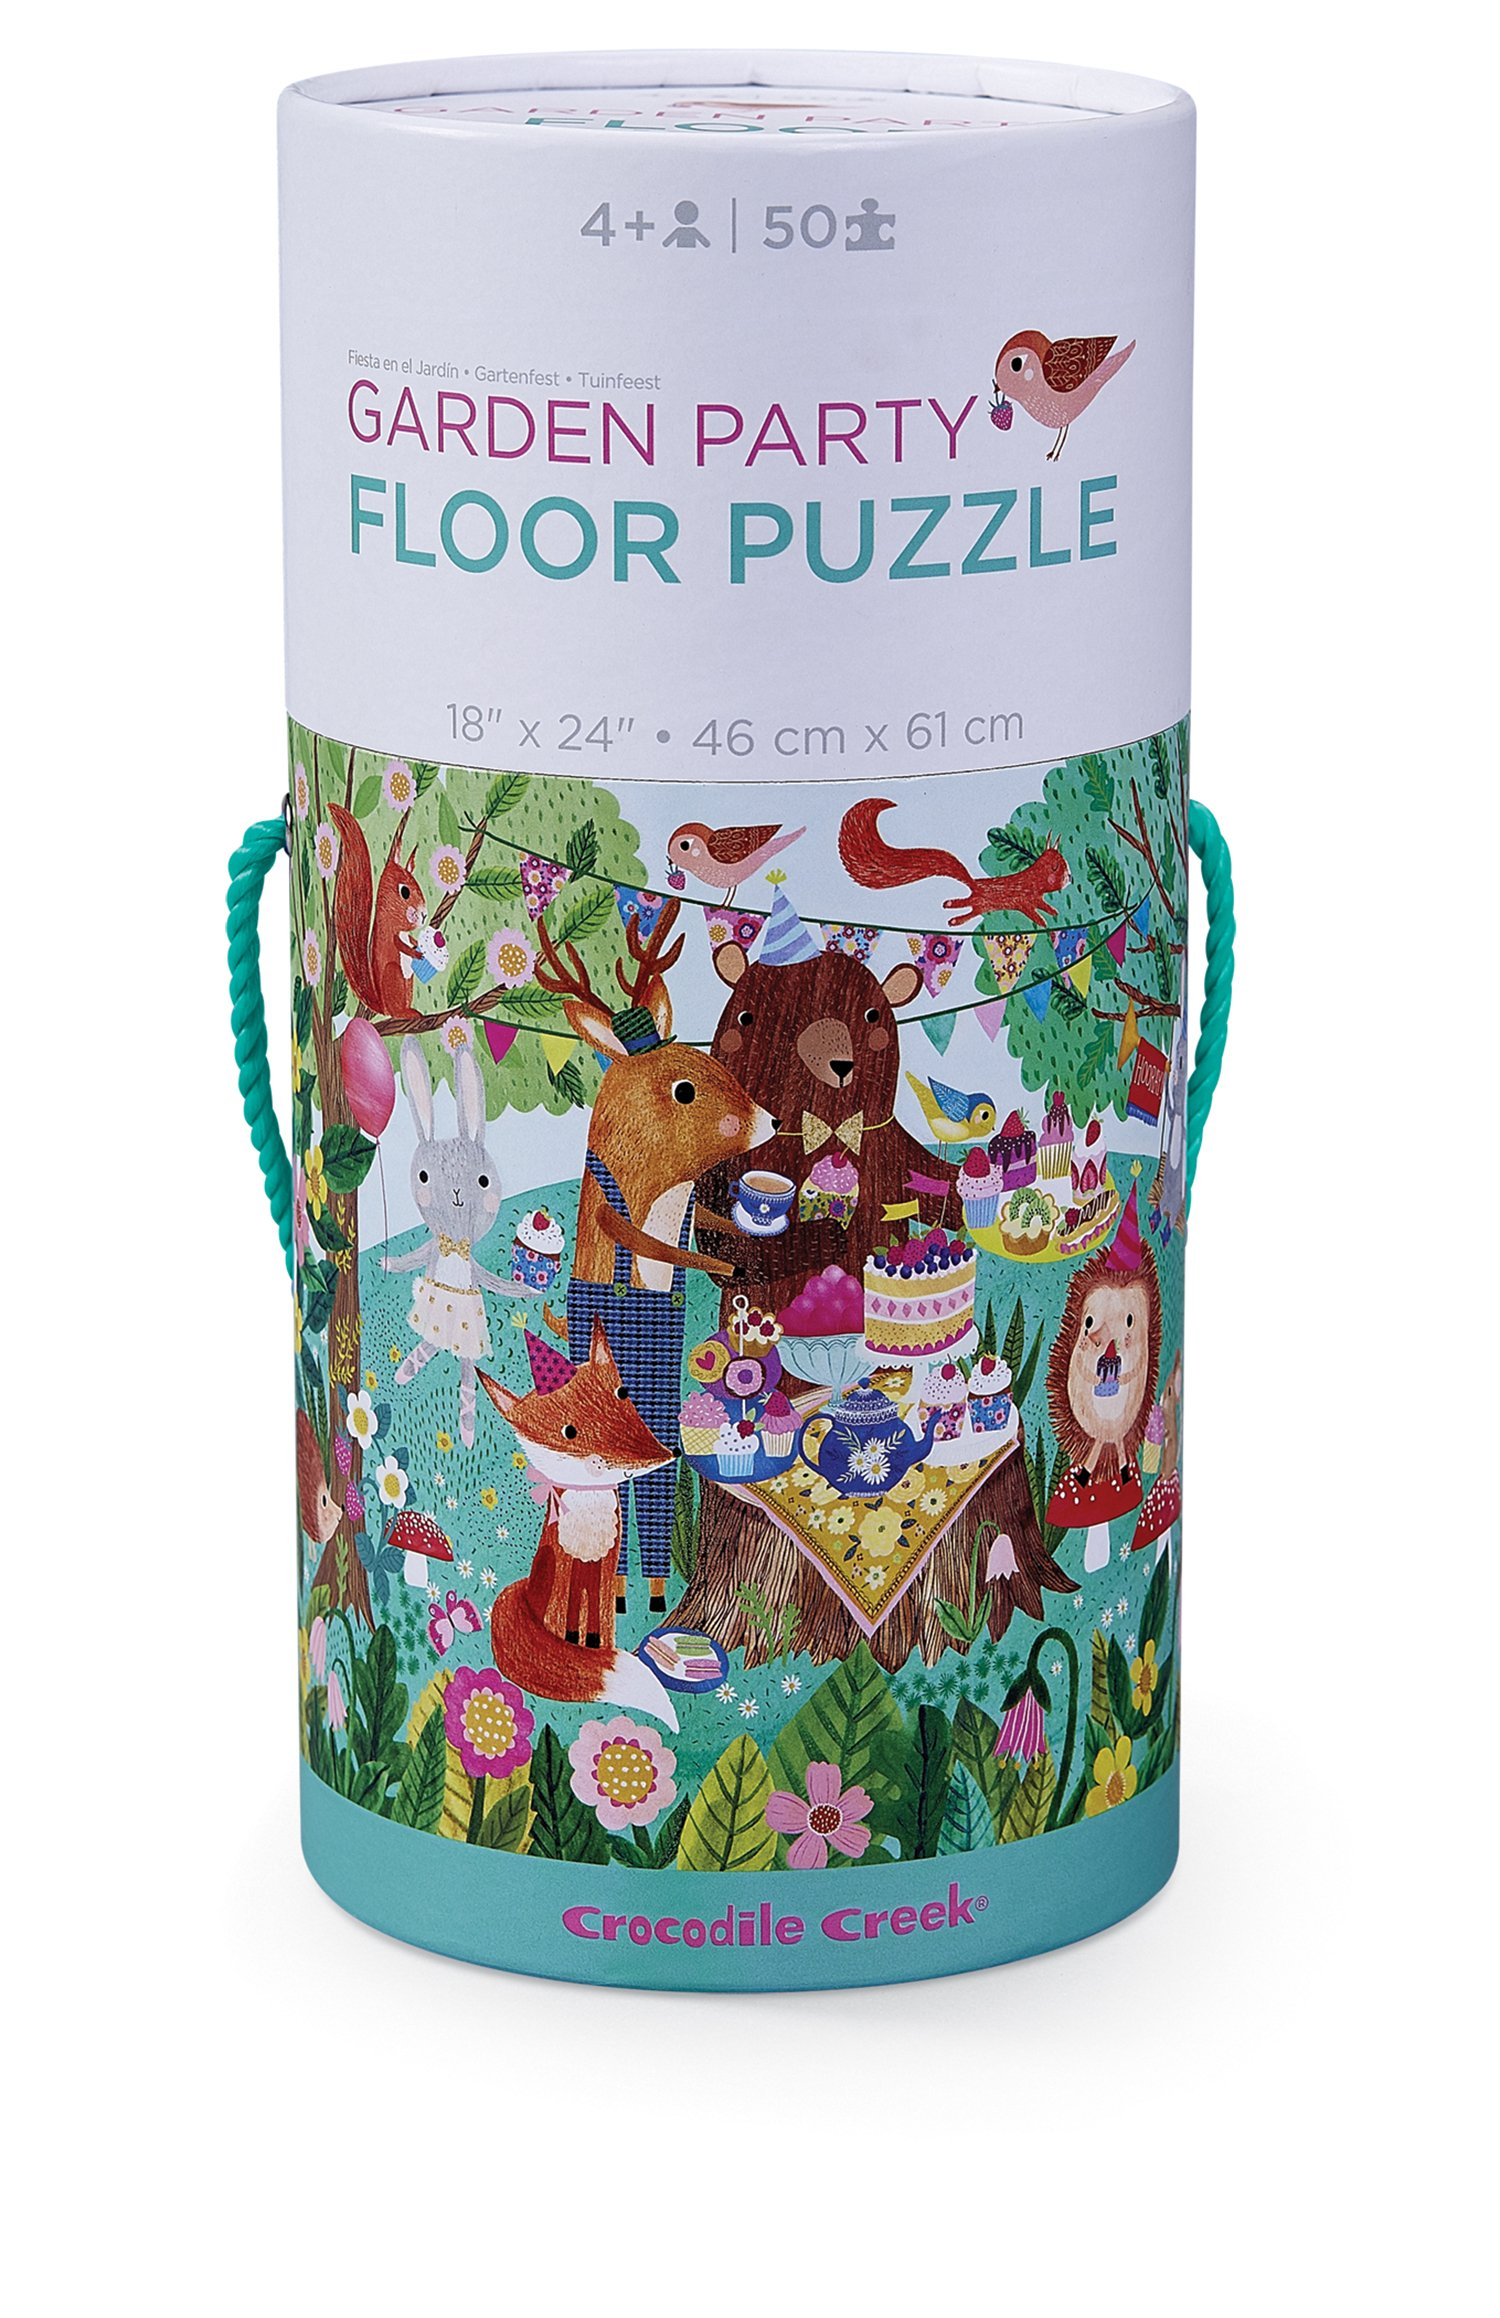 Crocodile Creek Garden Party Jigsaw Floor Puzzle Floor Jigsaw Puzzle by Crocodile Creek